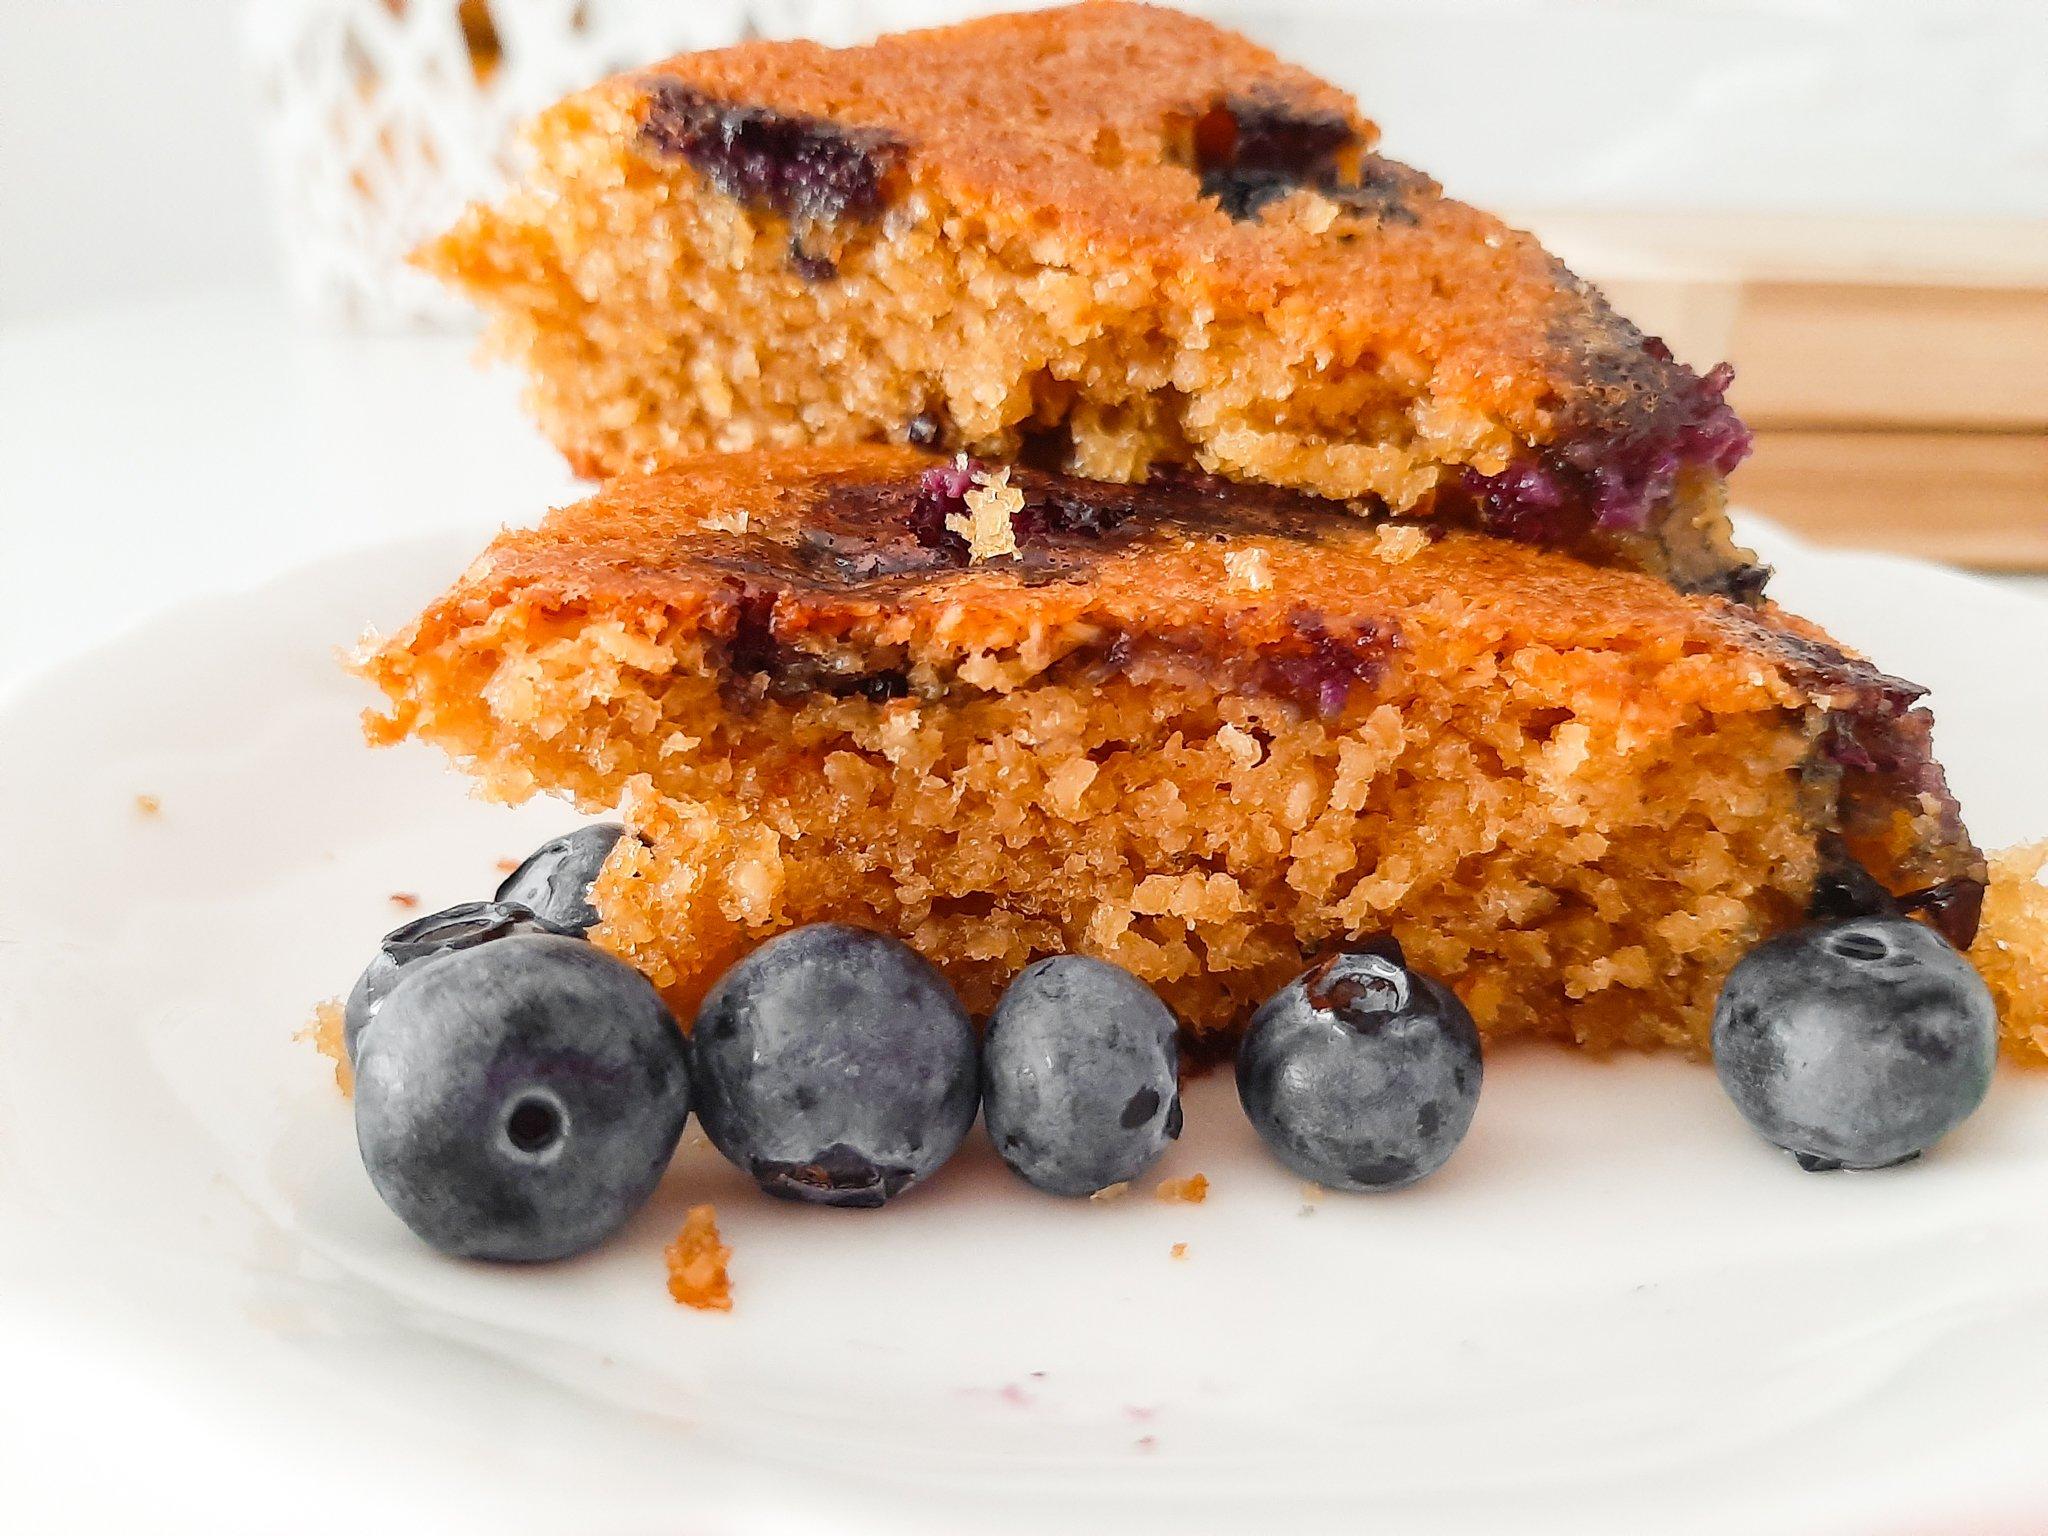 Oatmeal Blueberry Cake